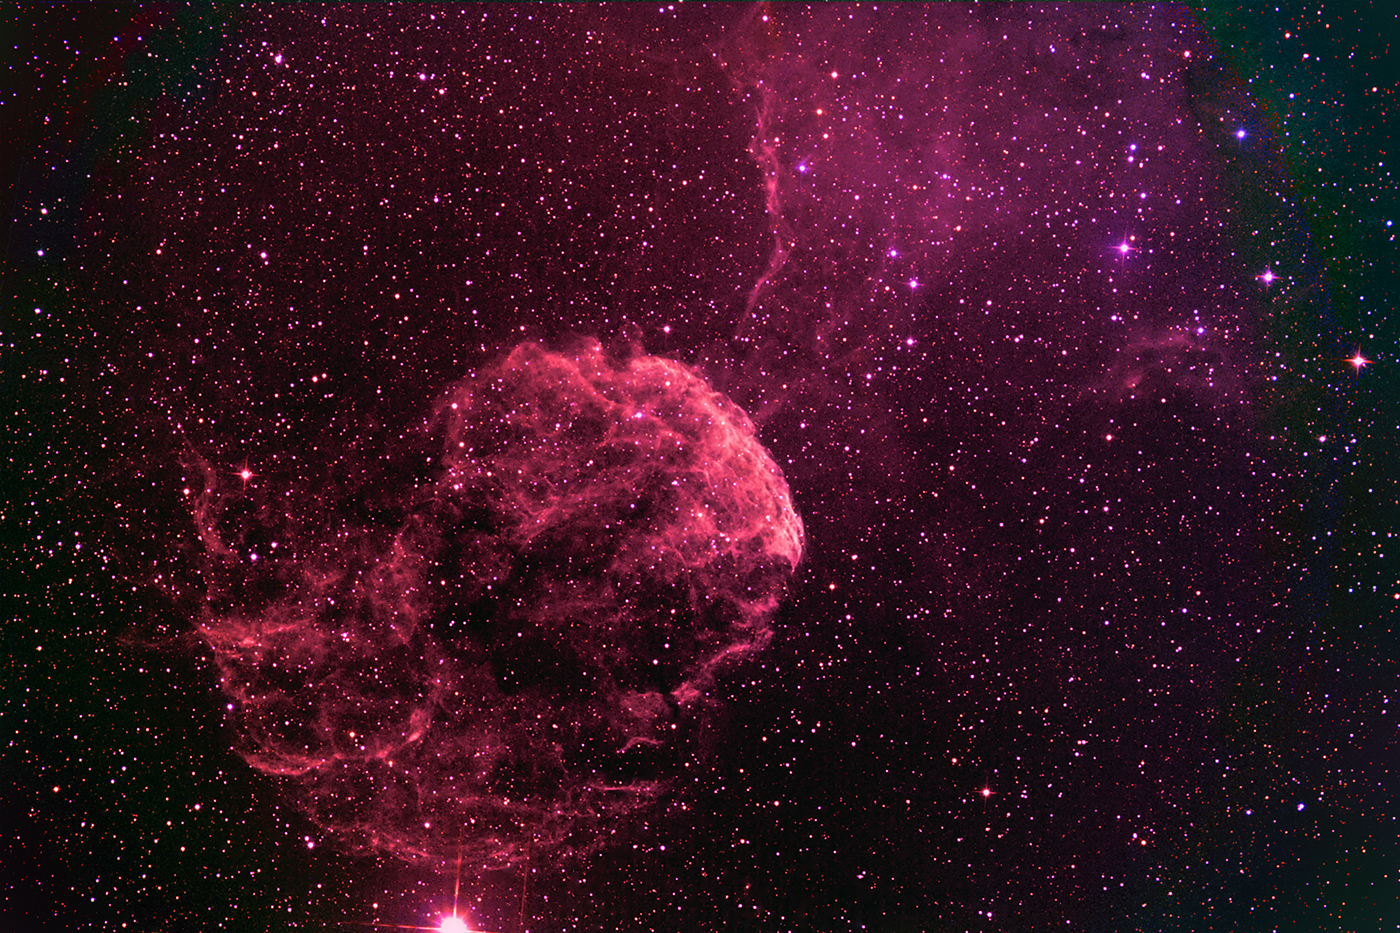 20170201-IC443-HRGB.jpg